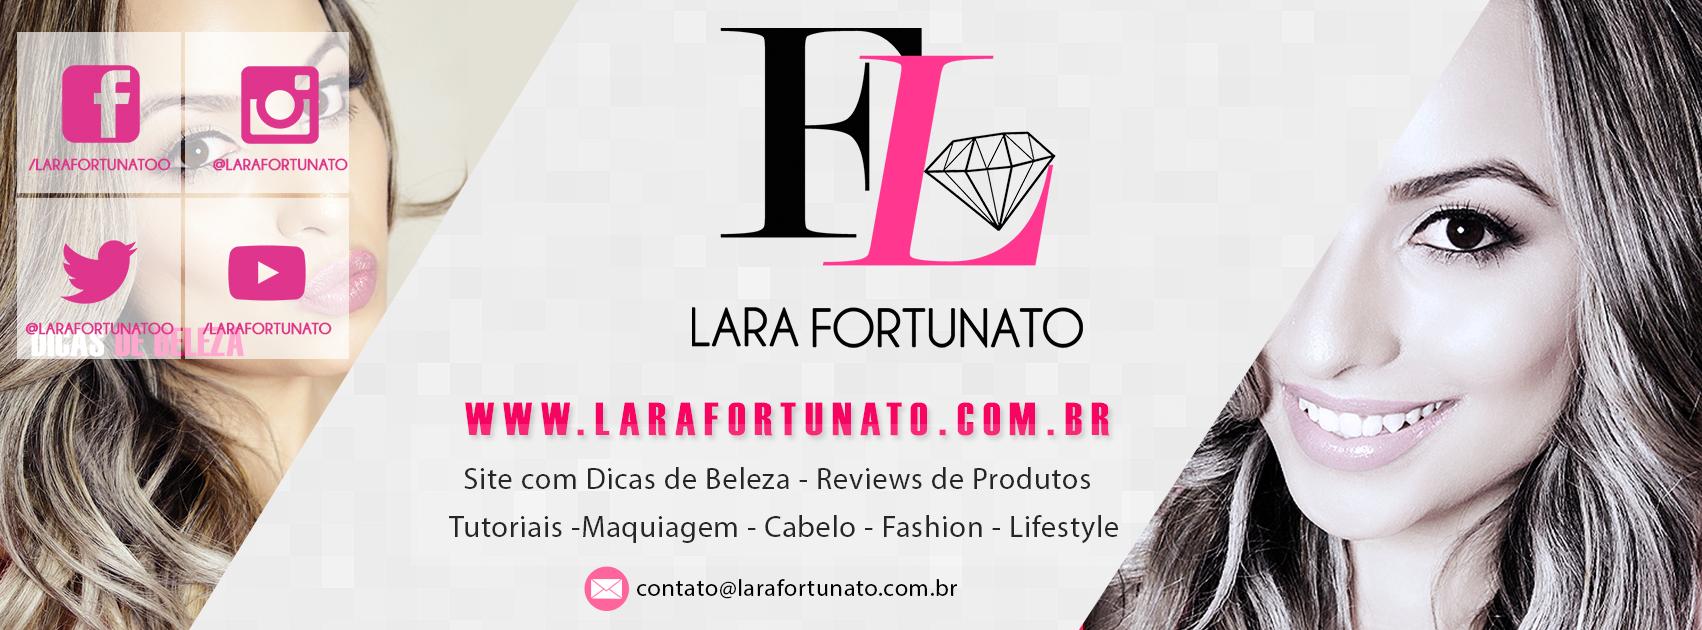 capa-nova-facebook-2016-lf